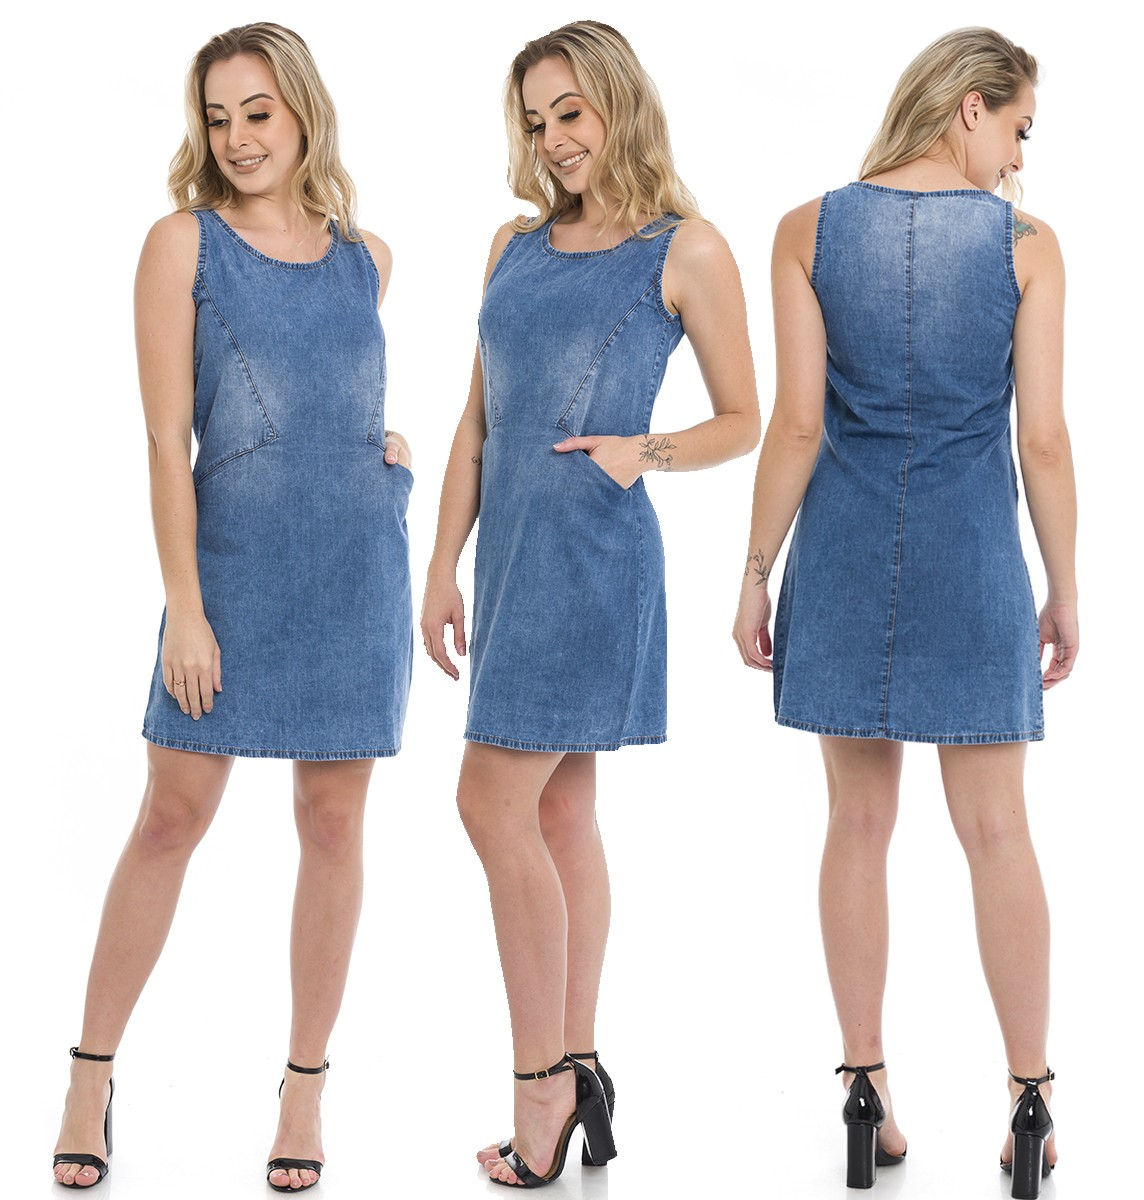 1712014 Vestido Jeans com Bolso Frontal (Completa)